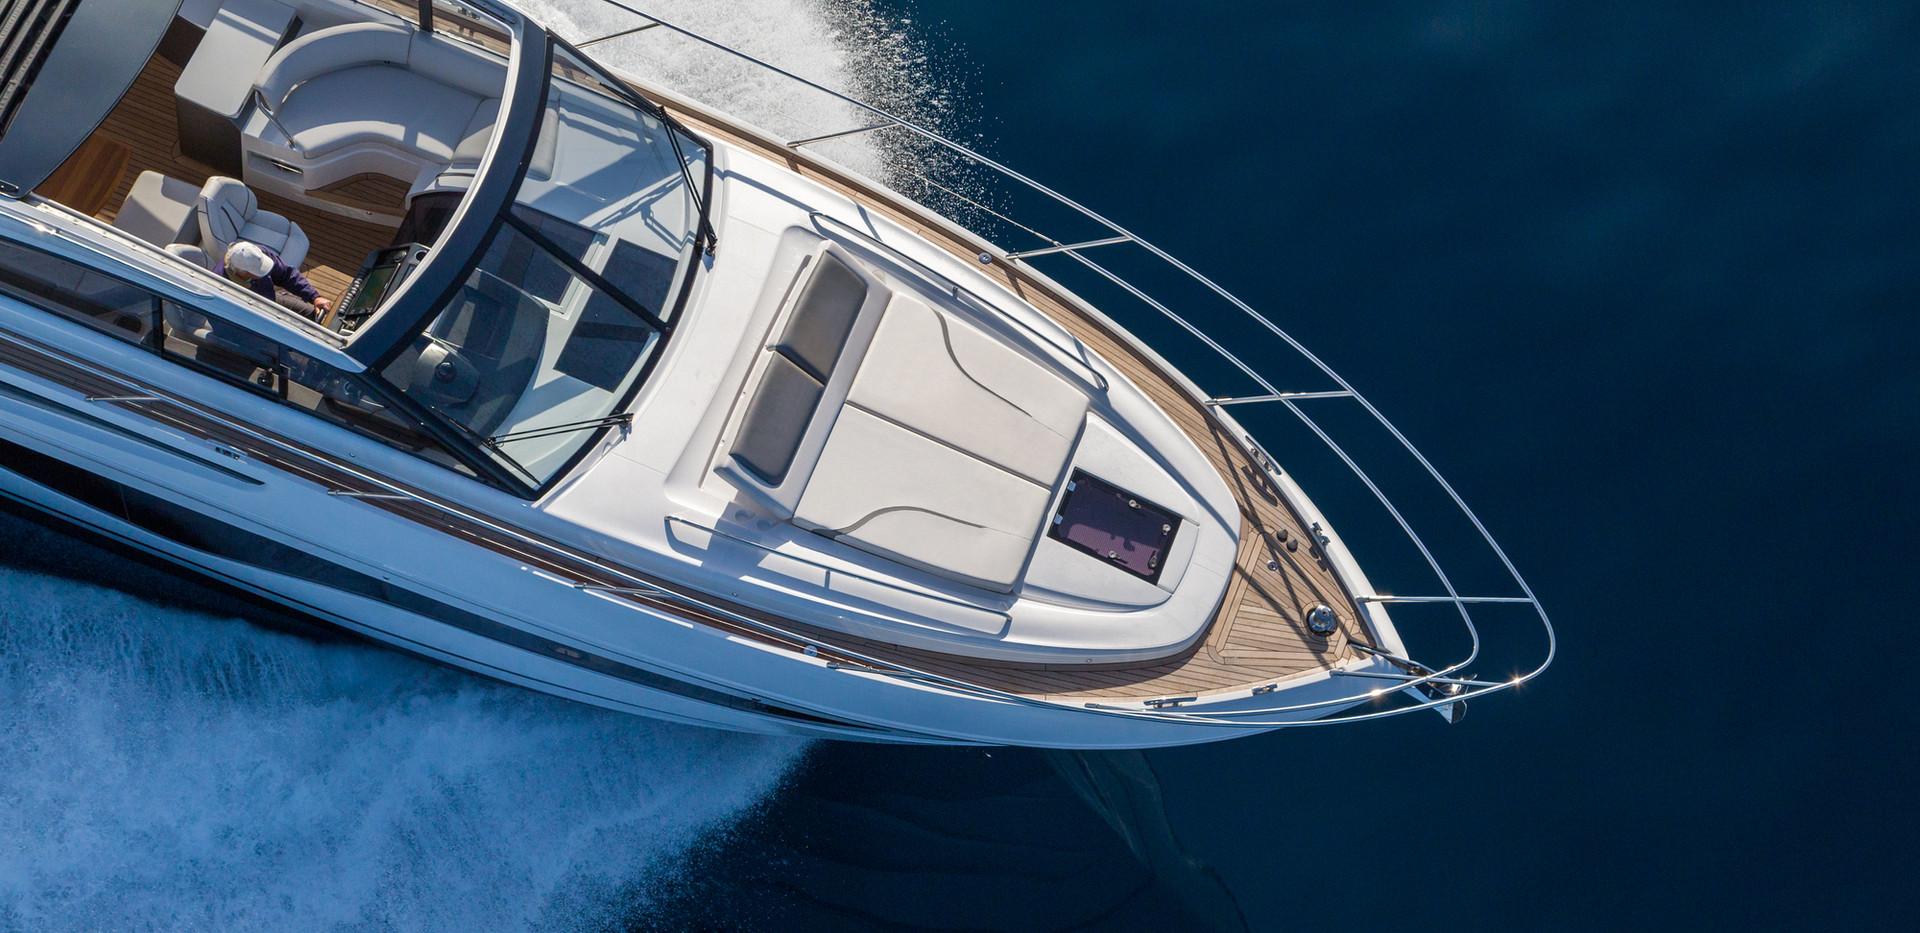 v50-open-exterior-white-hull-9Abromowitz